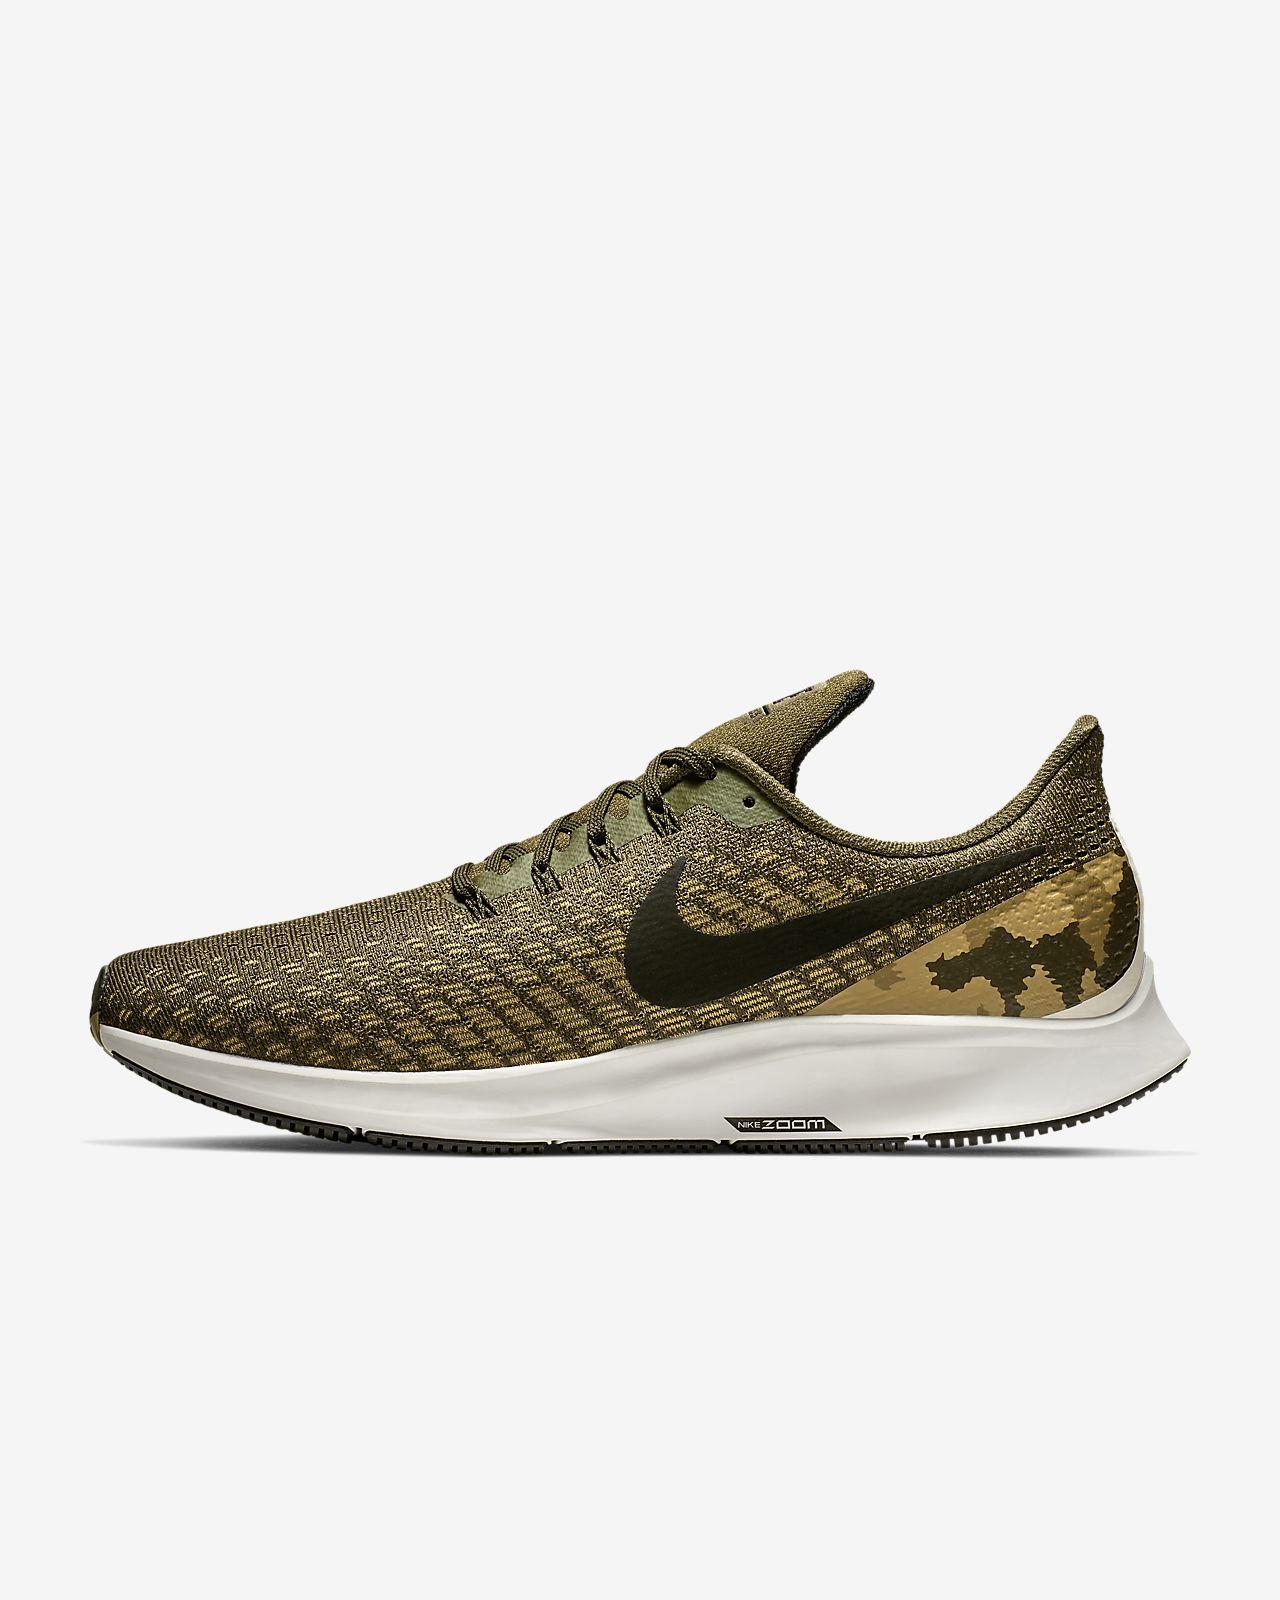 huge discount acee7 e25a1 Nike Air Zoom Pegasus 35 Zapatillas de running de camuflaje - Hombre